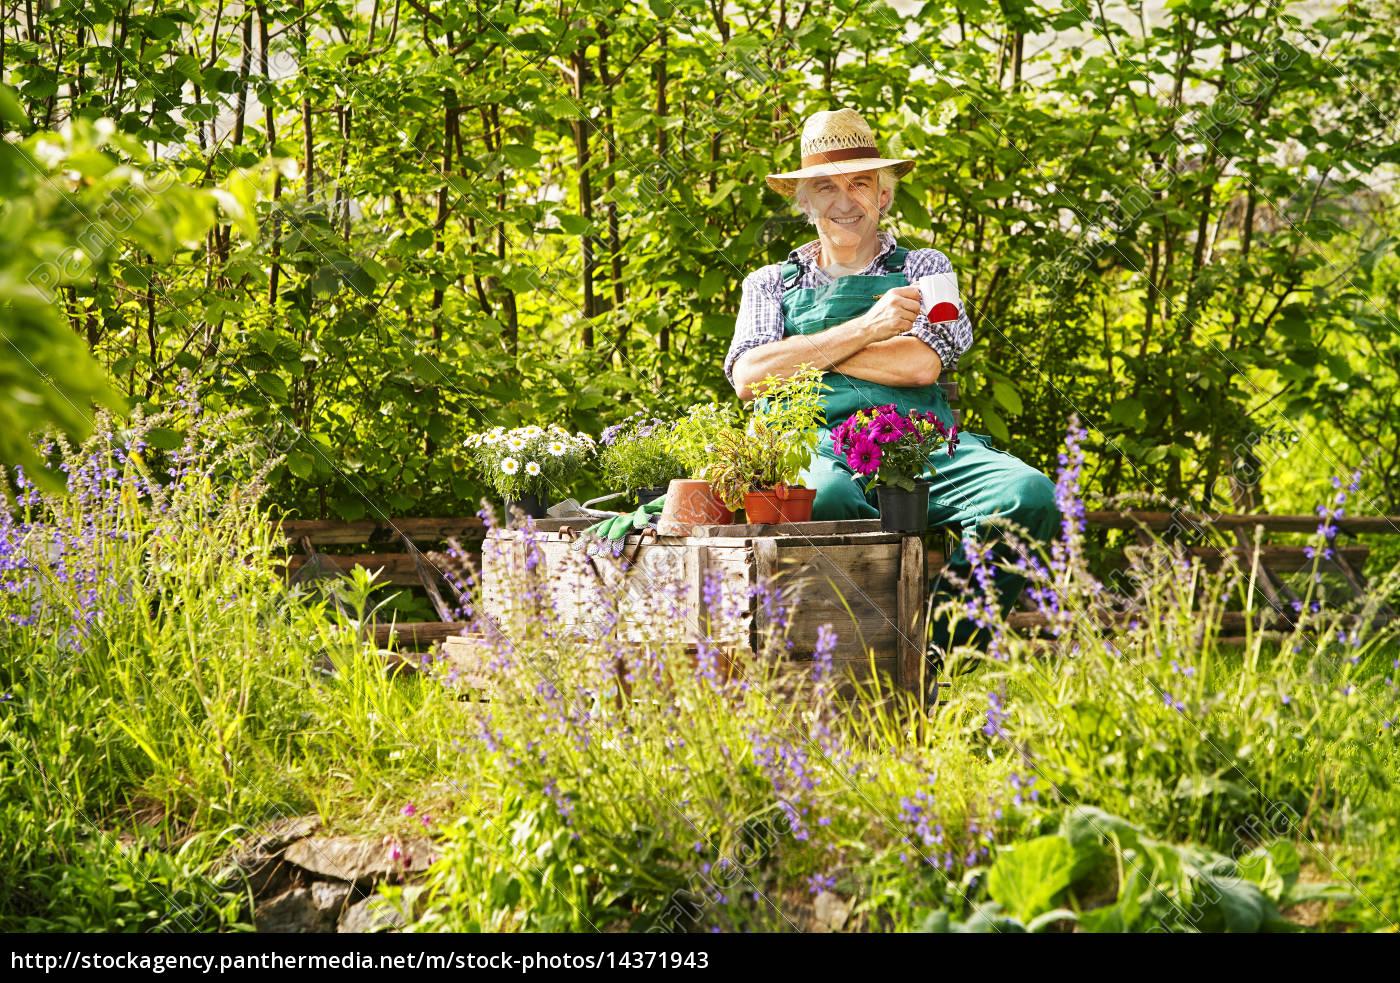 Garten Gärtner Strohhut Pflanzen Sitzen Kaffe Trinken Lizenzfreies